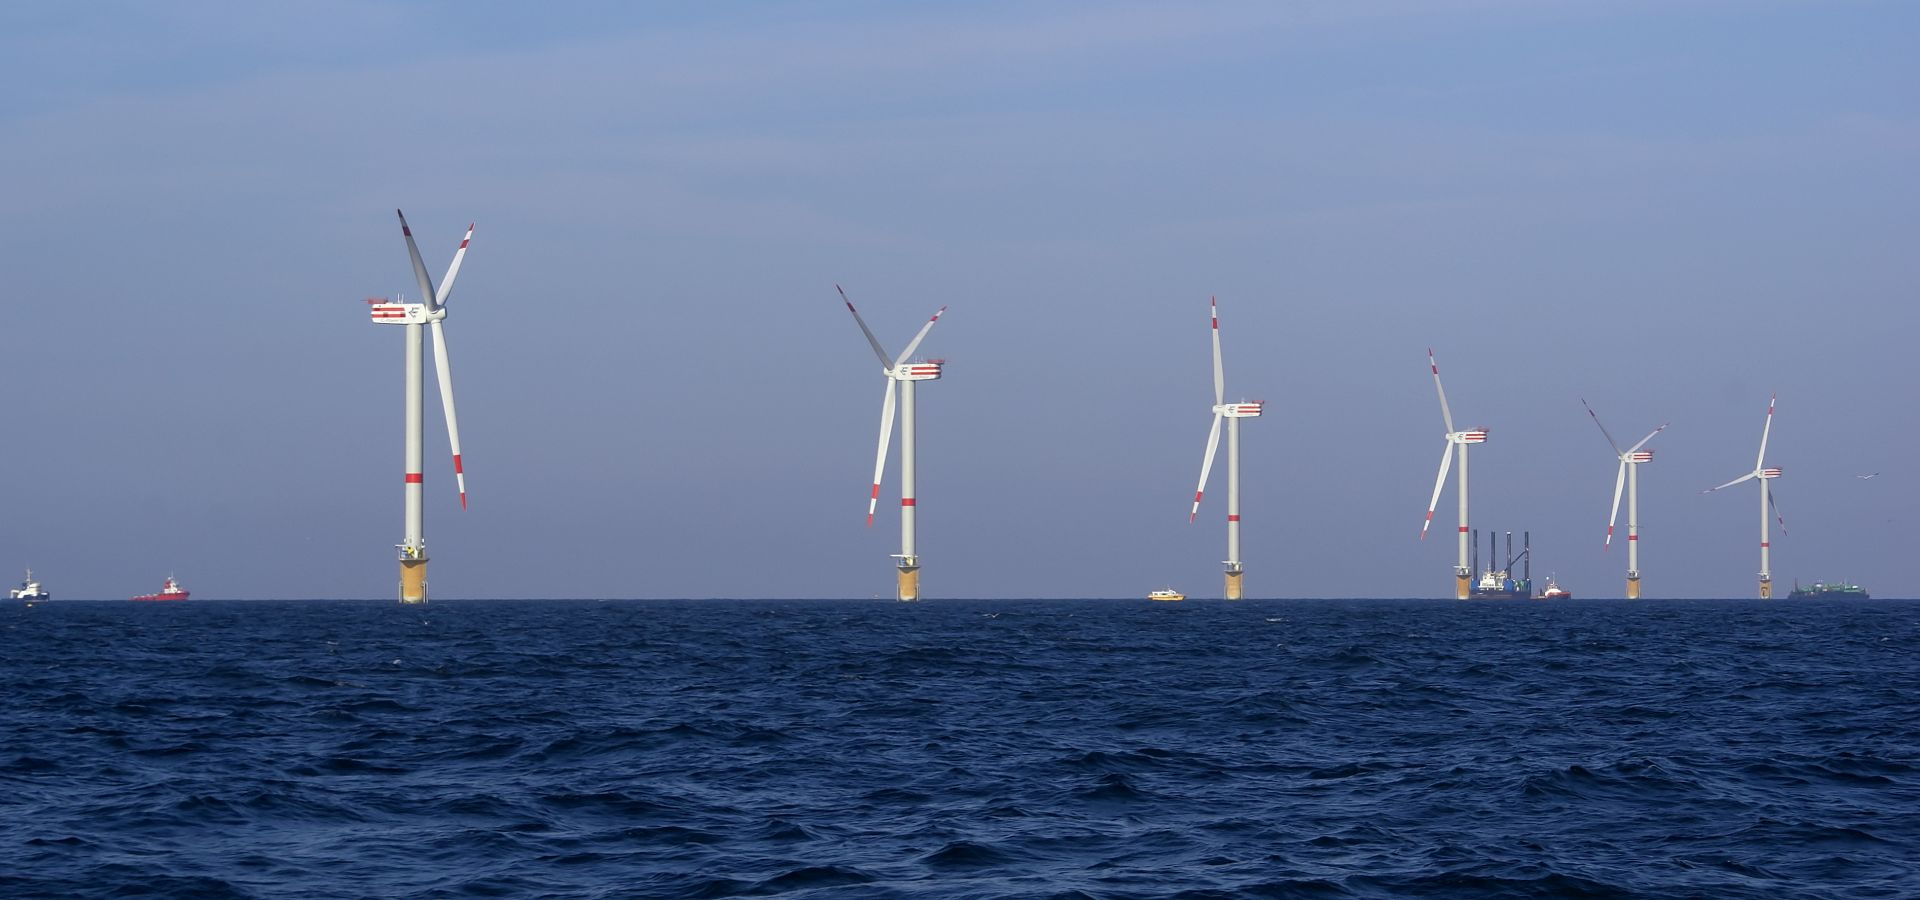 Windmills in the Belgian North Sea Thornton Bank